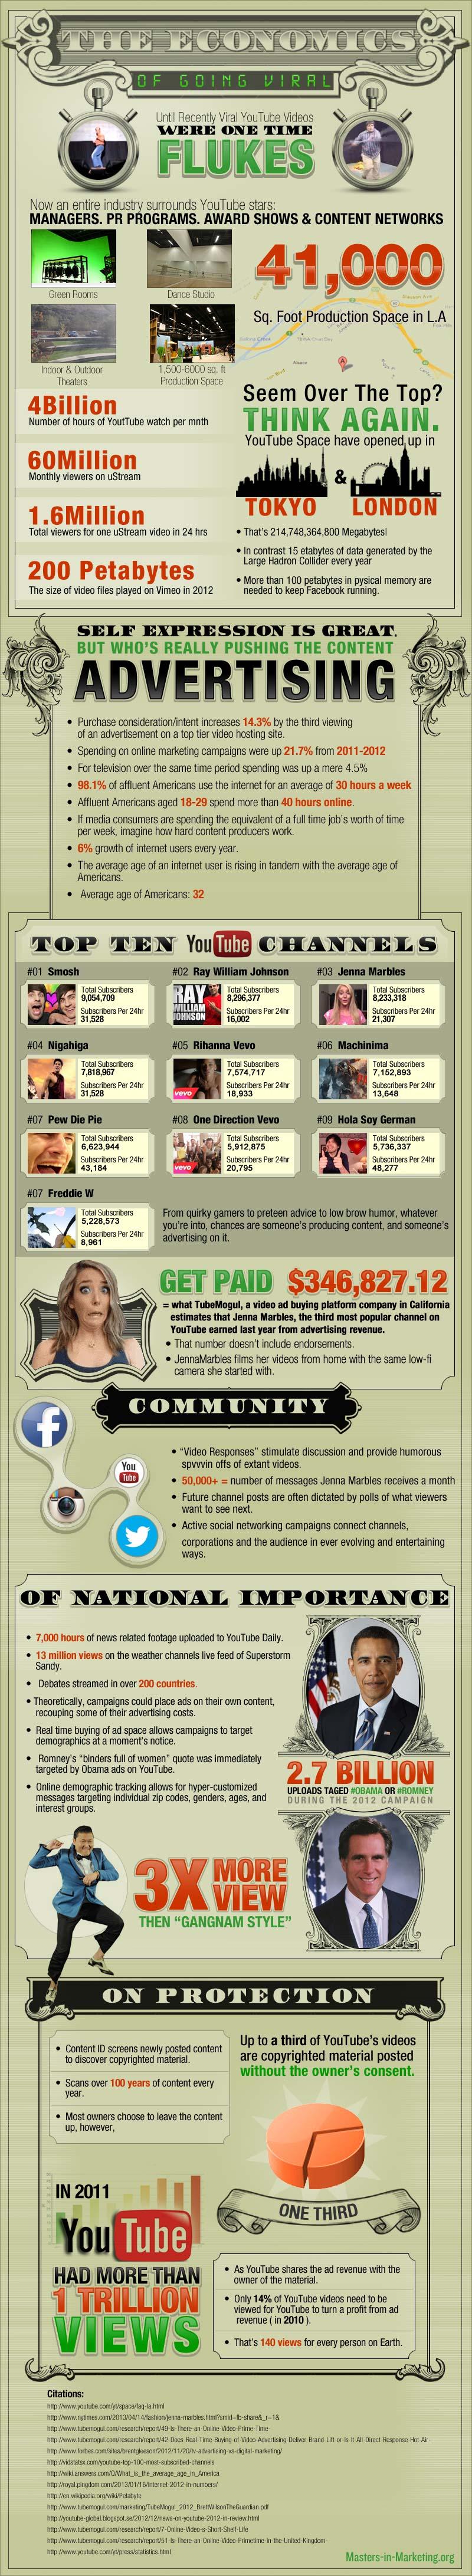 Video Virality Economics-Infographic